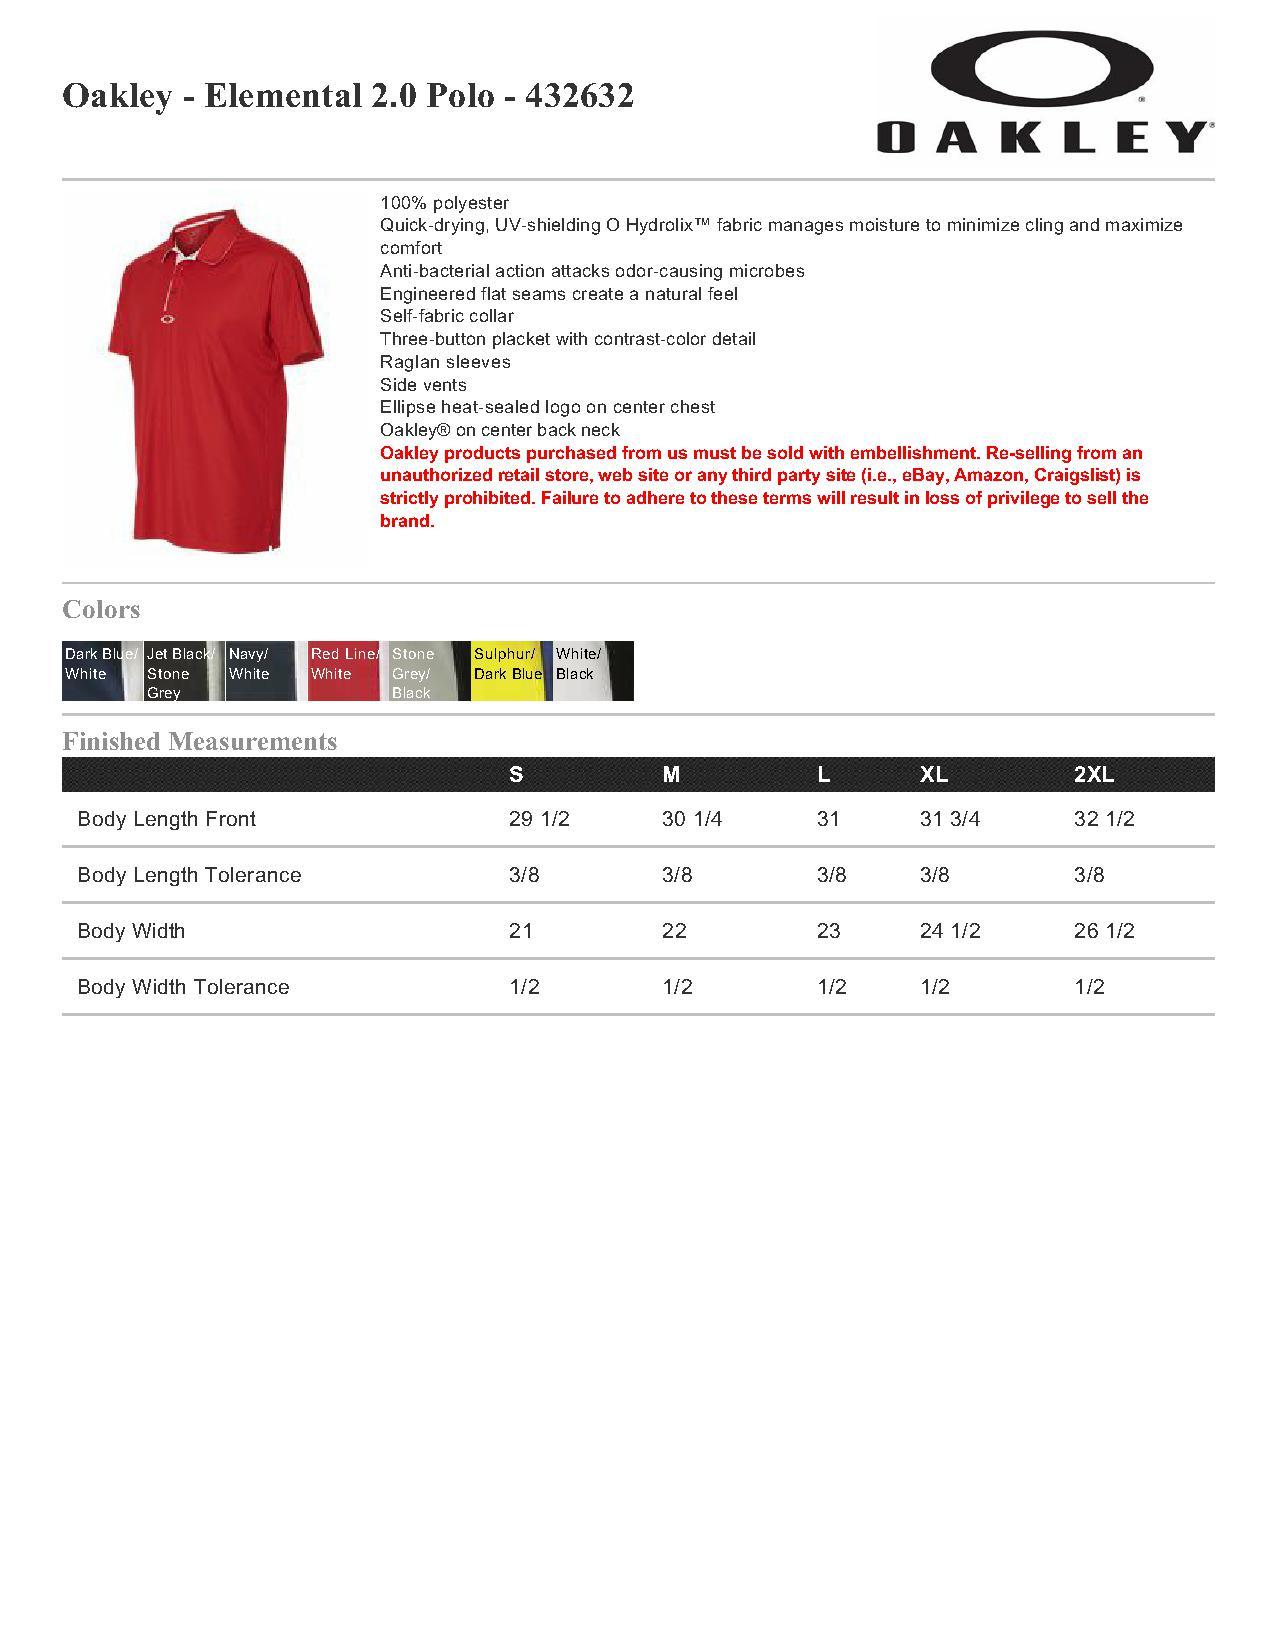 53222eaad8 Oakley 432632 Elemental 2.0 Polo  31.25 - Men s Sport Shirts